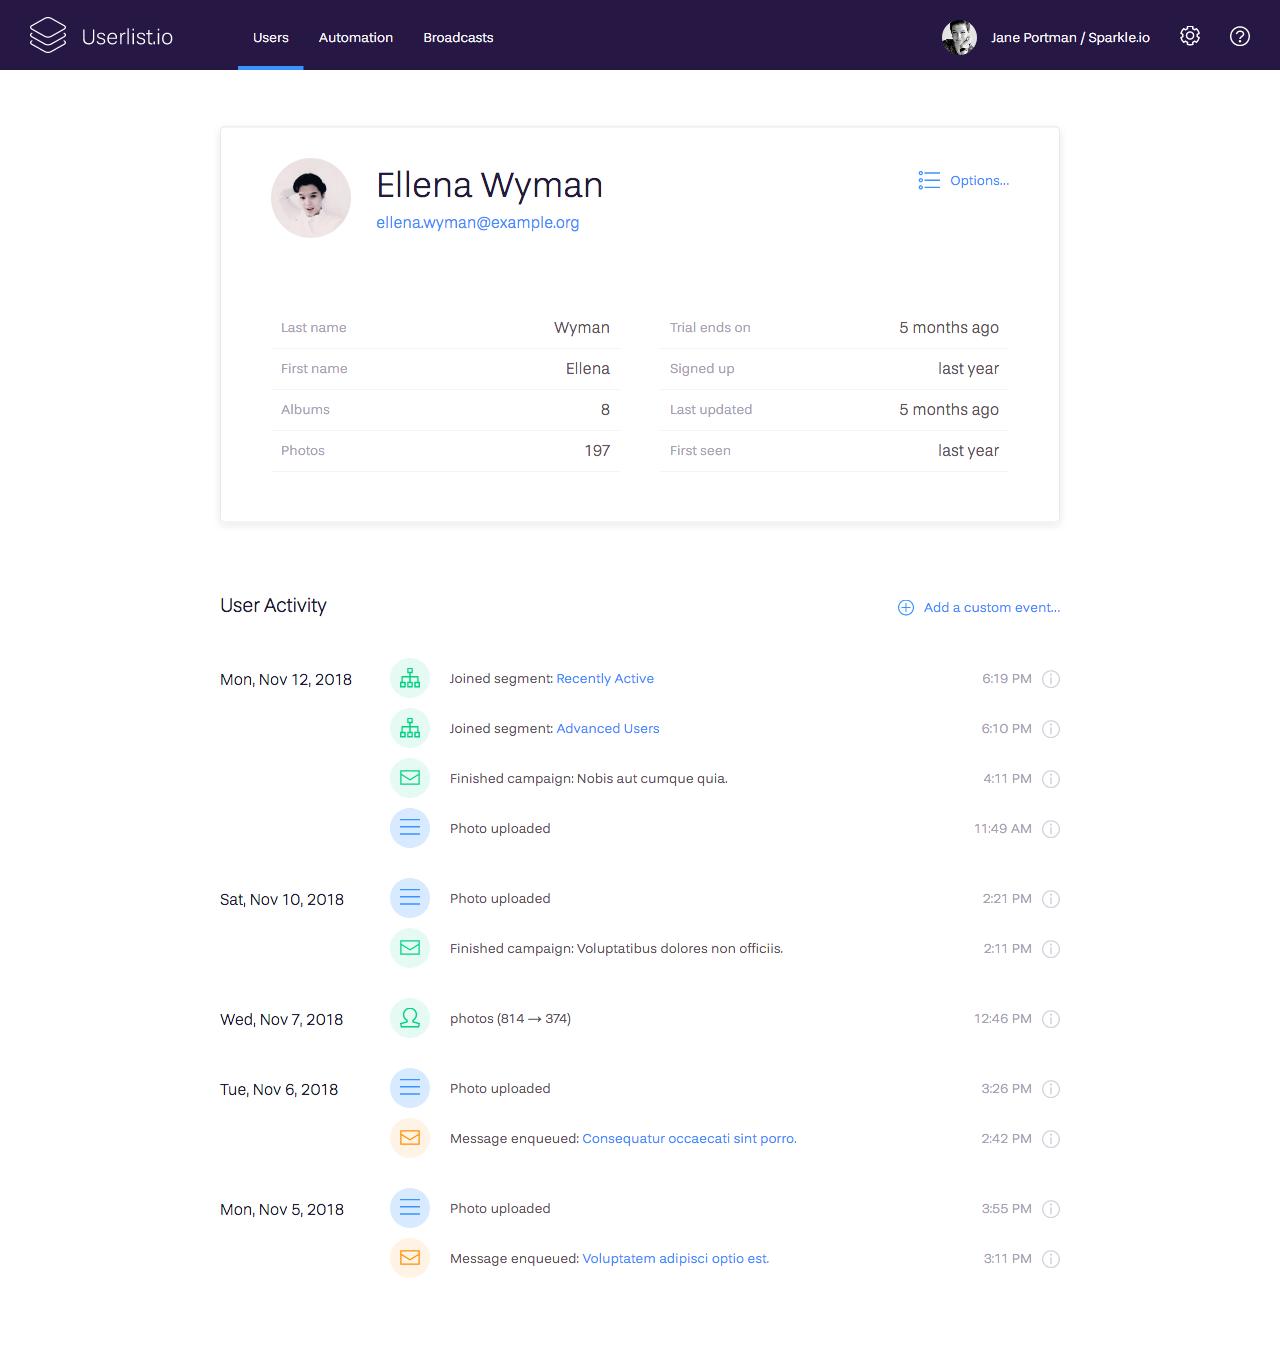 Explore individual user profiles